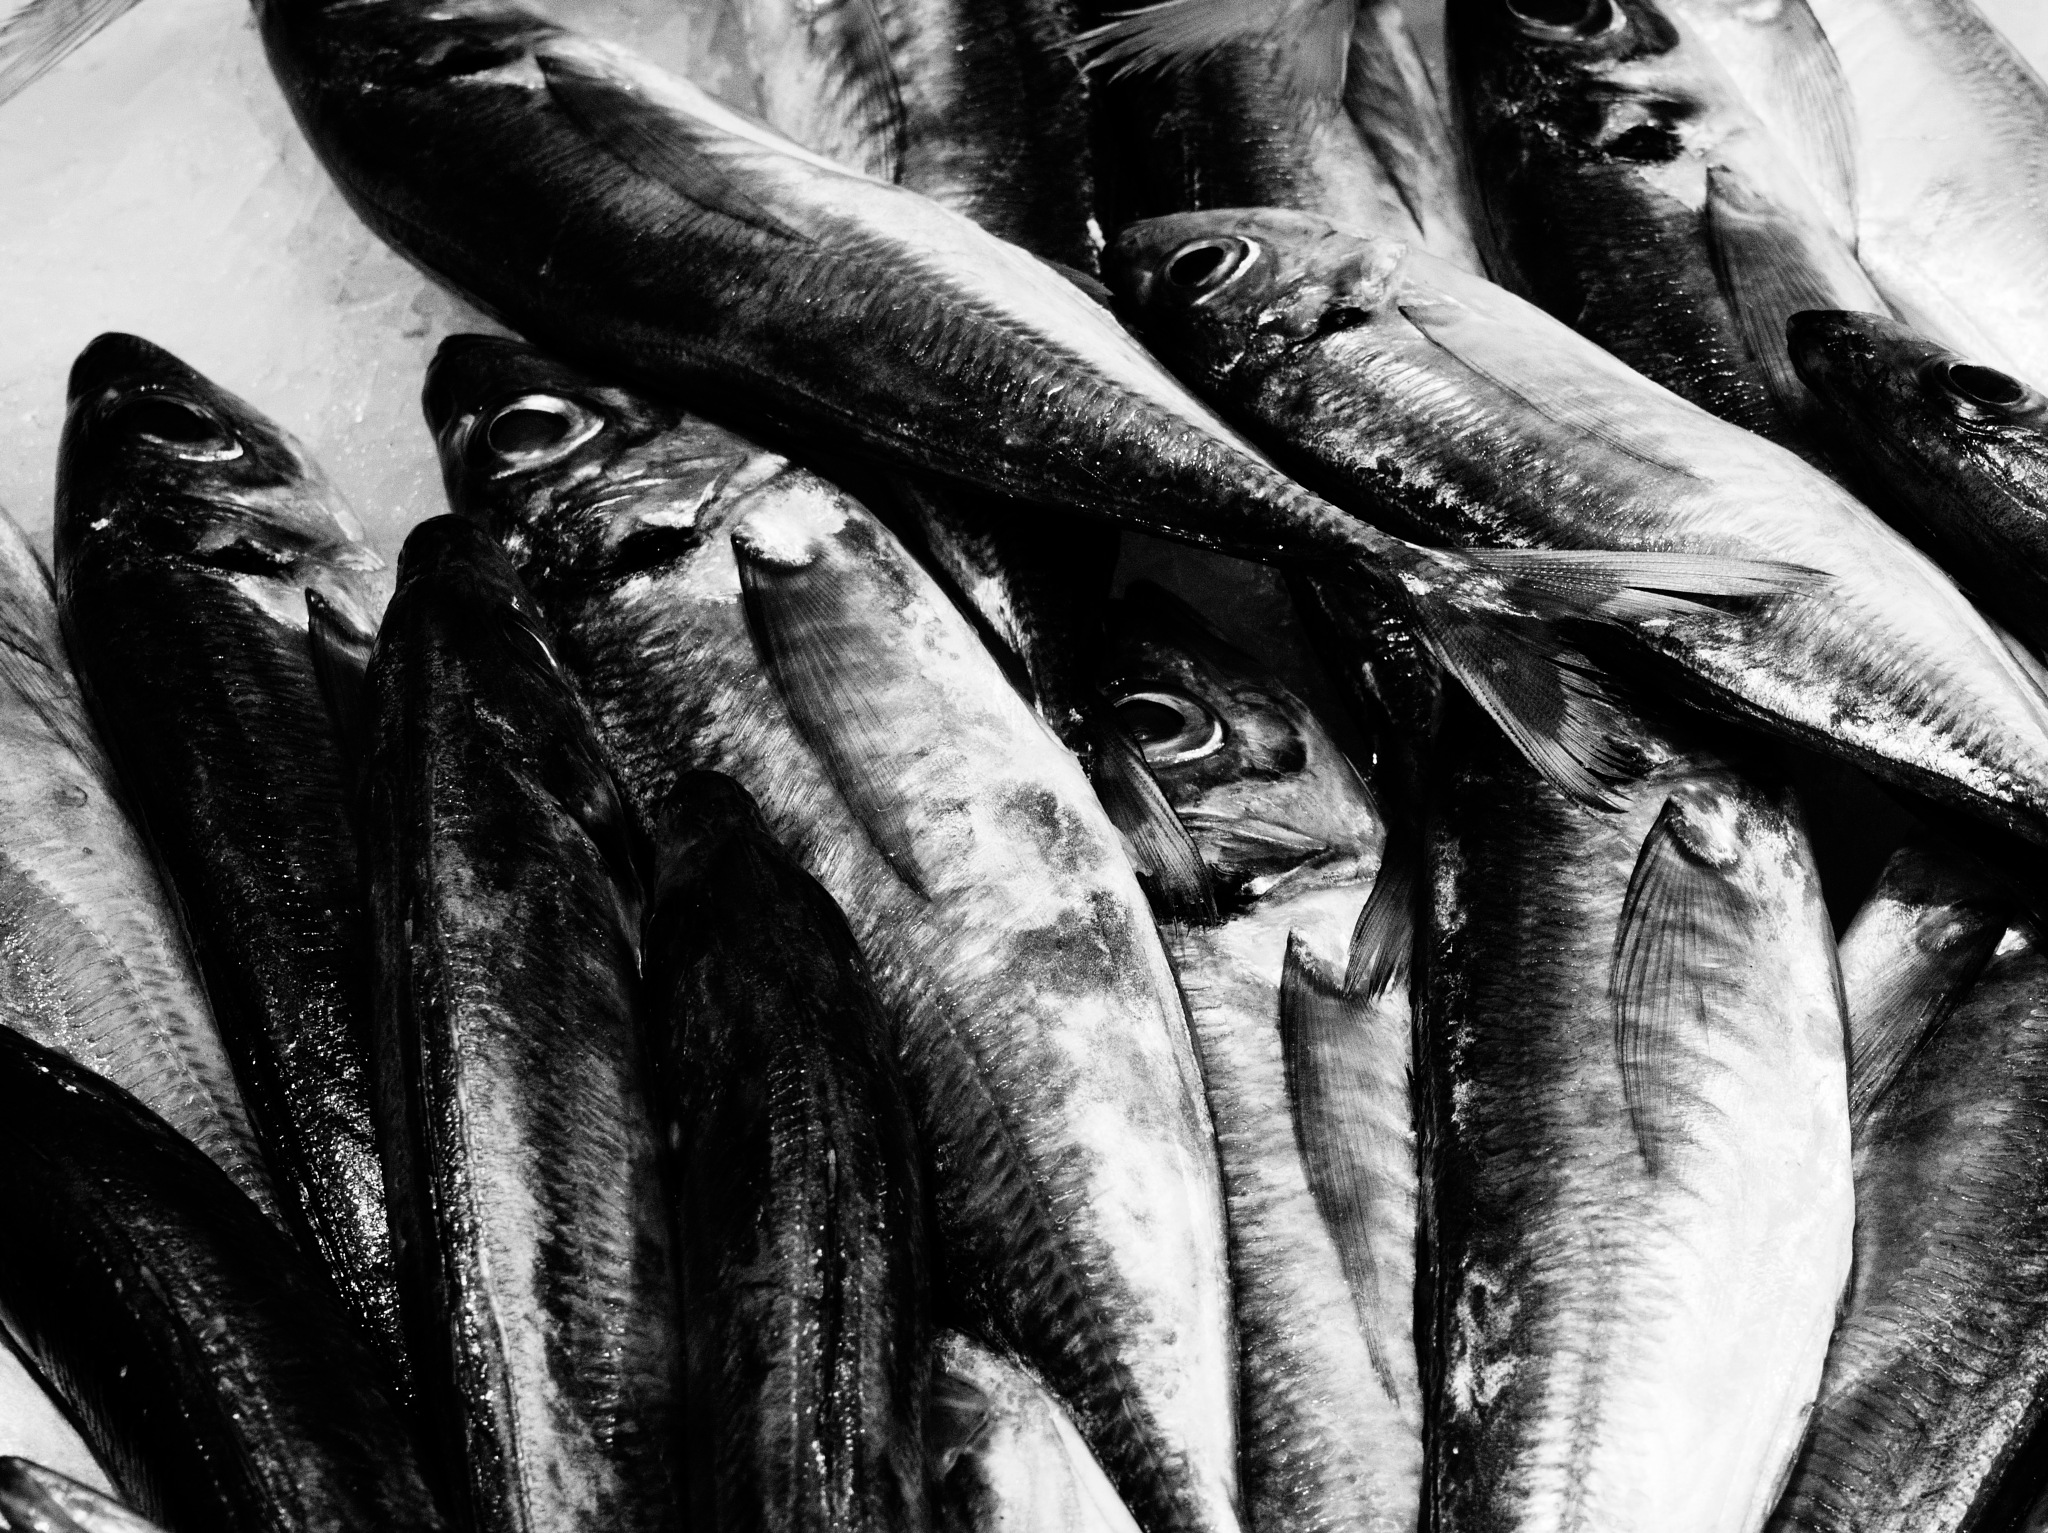 Fish by gabriele.zucchella